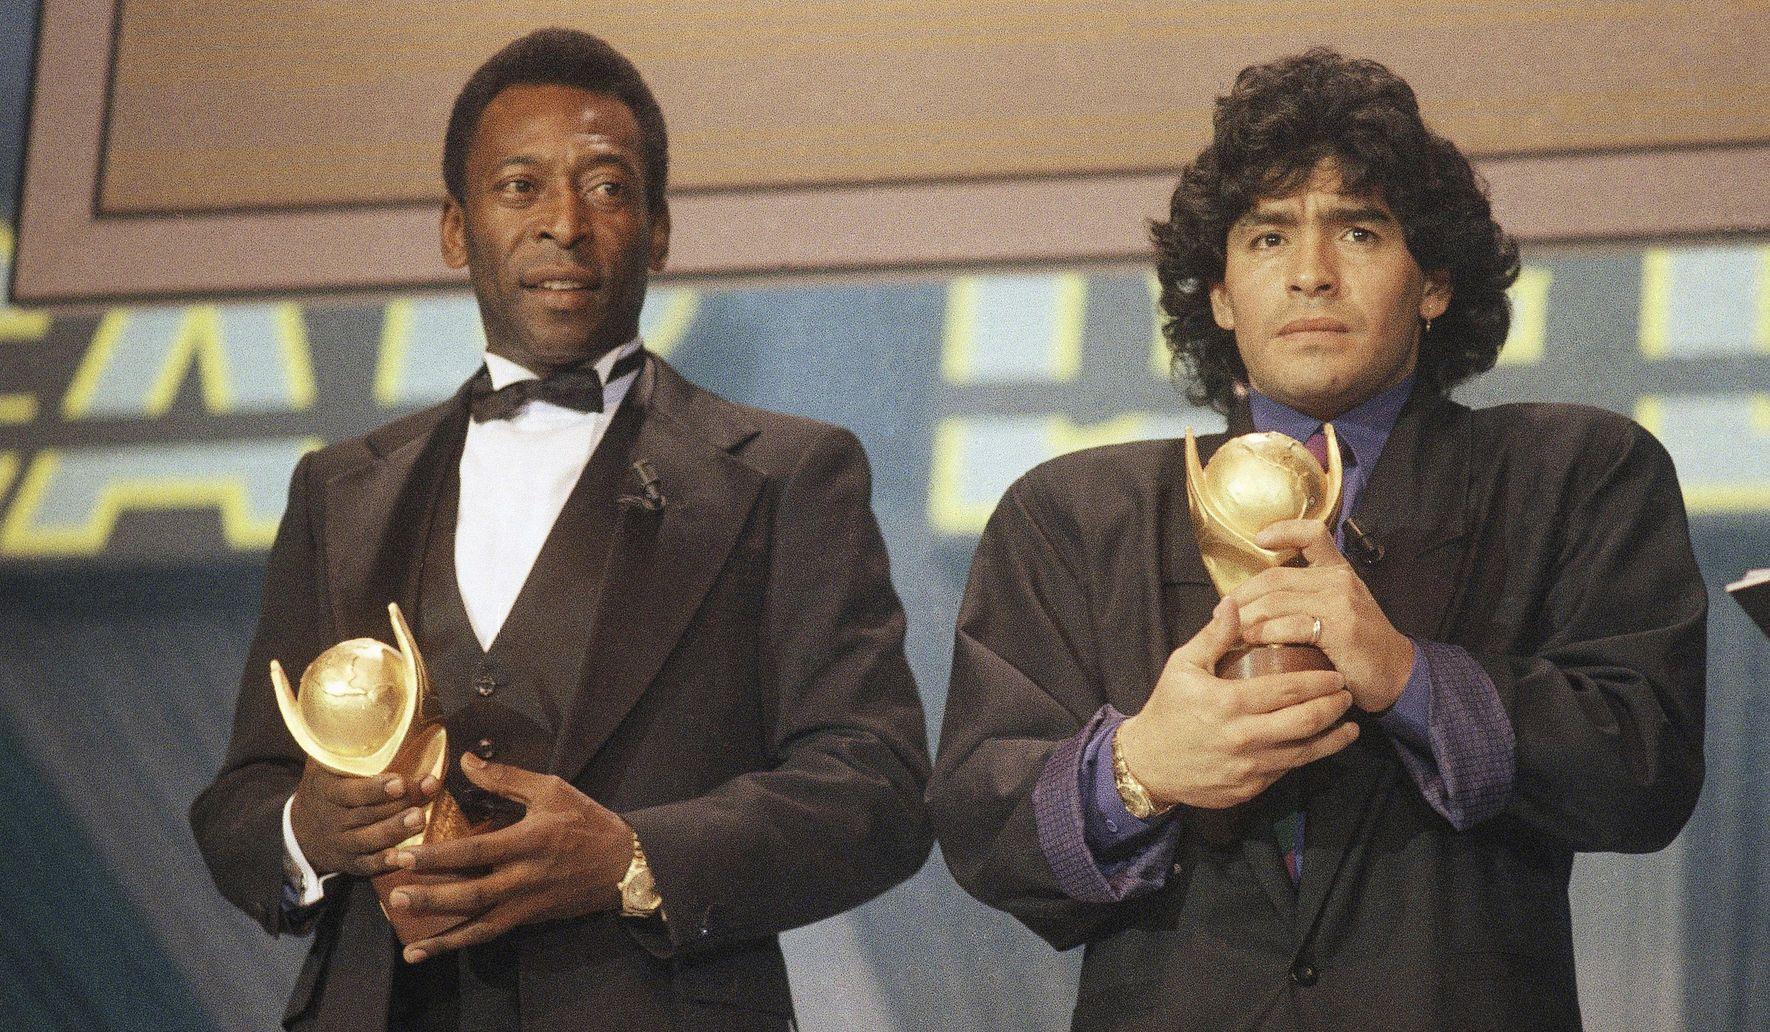 Maradona_obit_73643_c0-0-3001-1749_s1770x1032